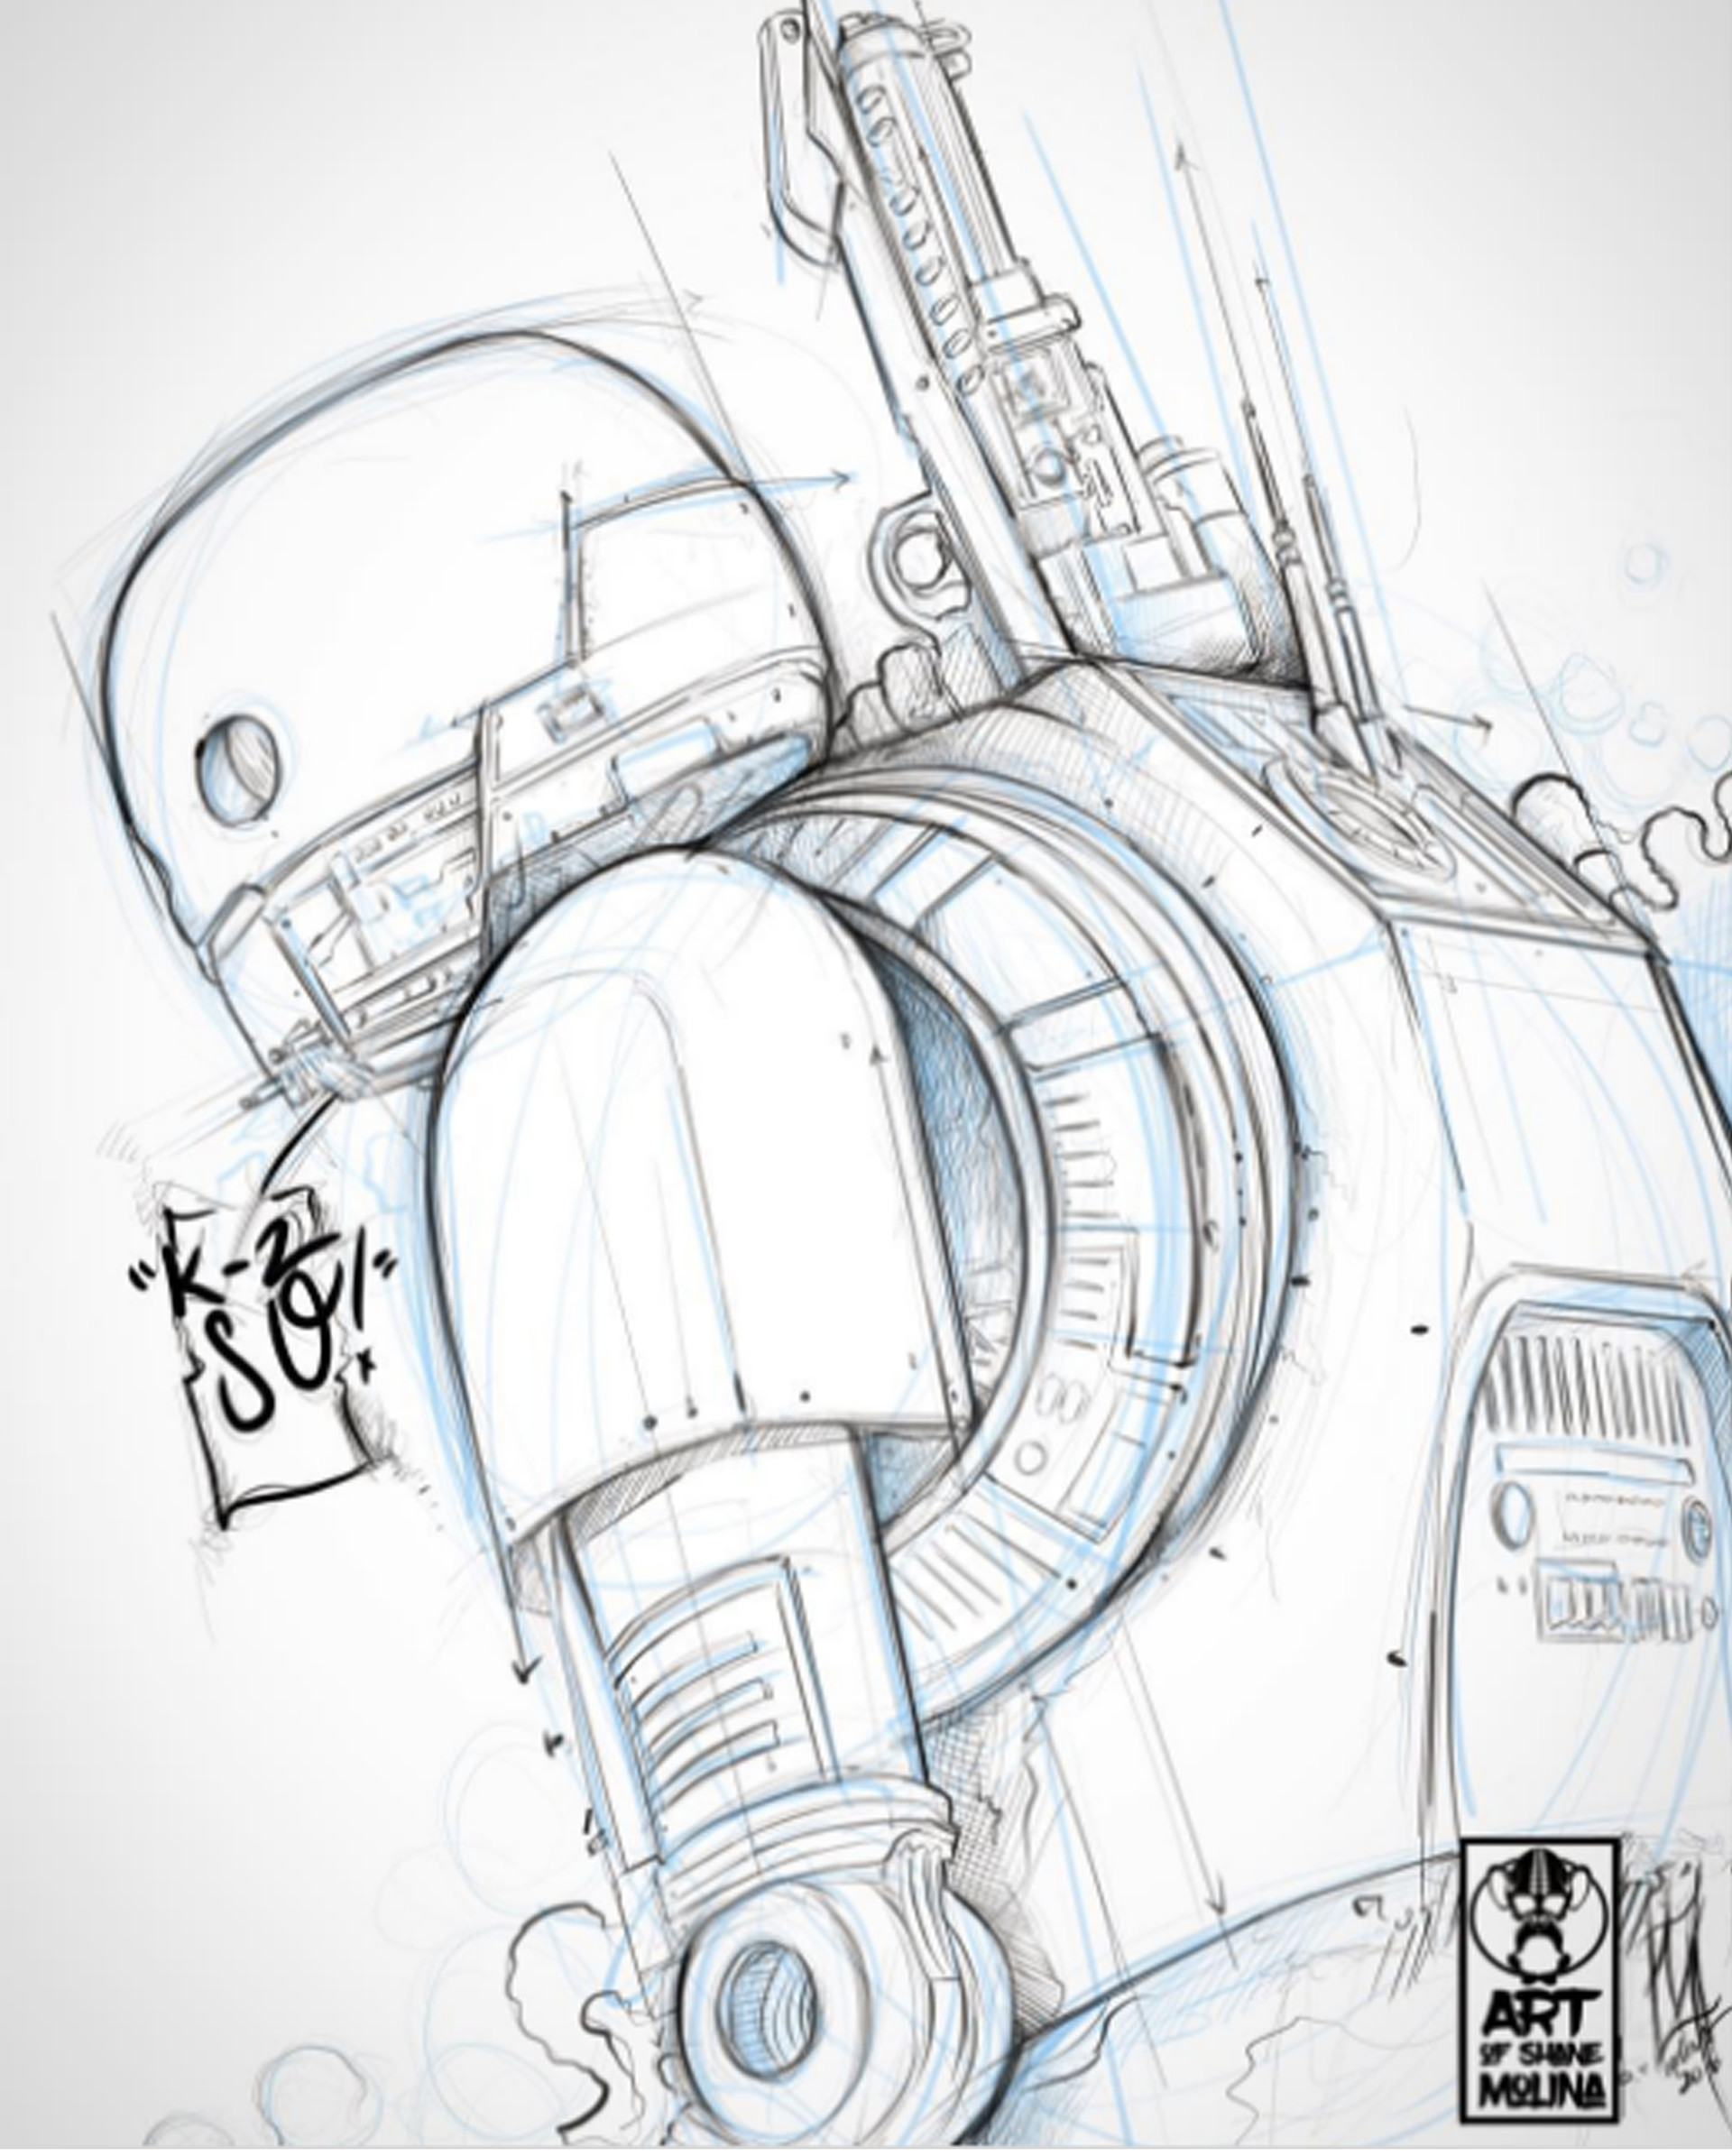 Shane molina k 2s0 sketch